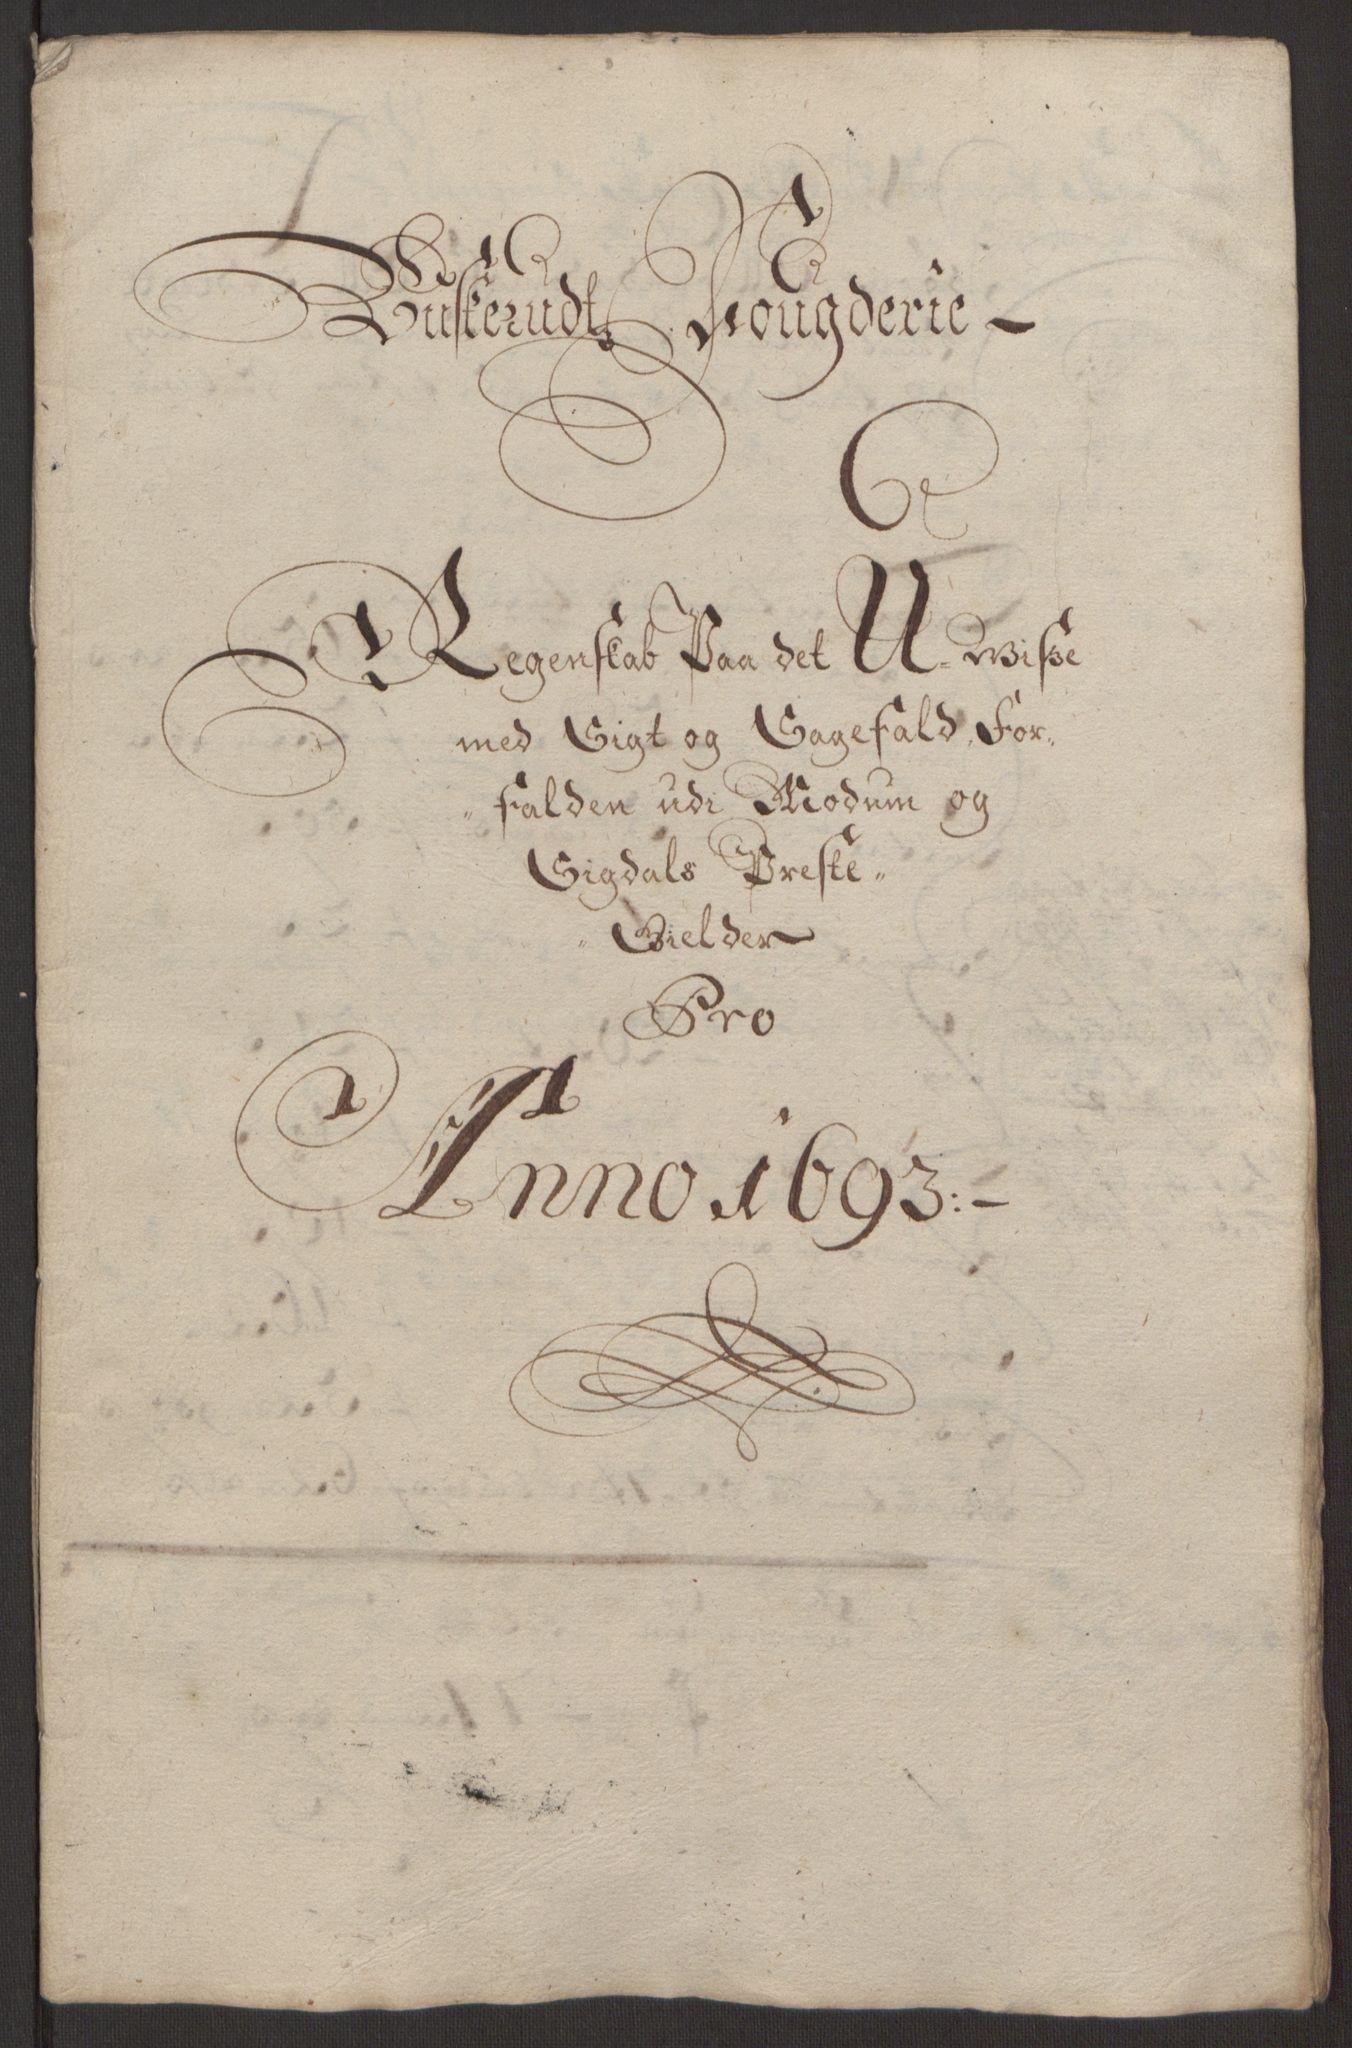 RA, Rentekammeret inntil 1814, Reviderte regnskaper, Fogderegnskap, R25/L1682: Fogderegnskap Buskerud, 1693, s. 12